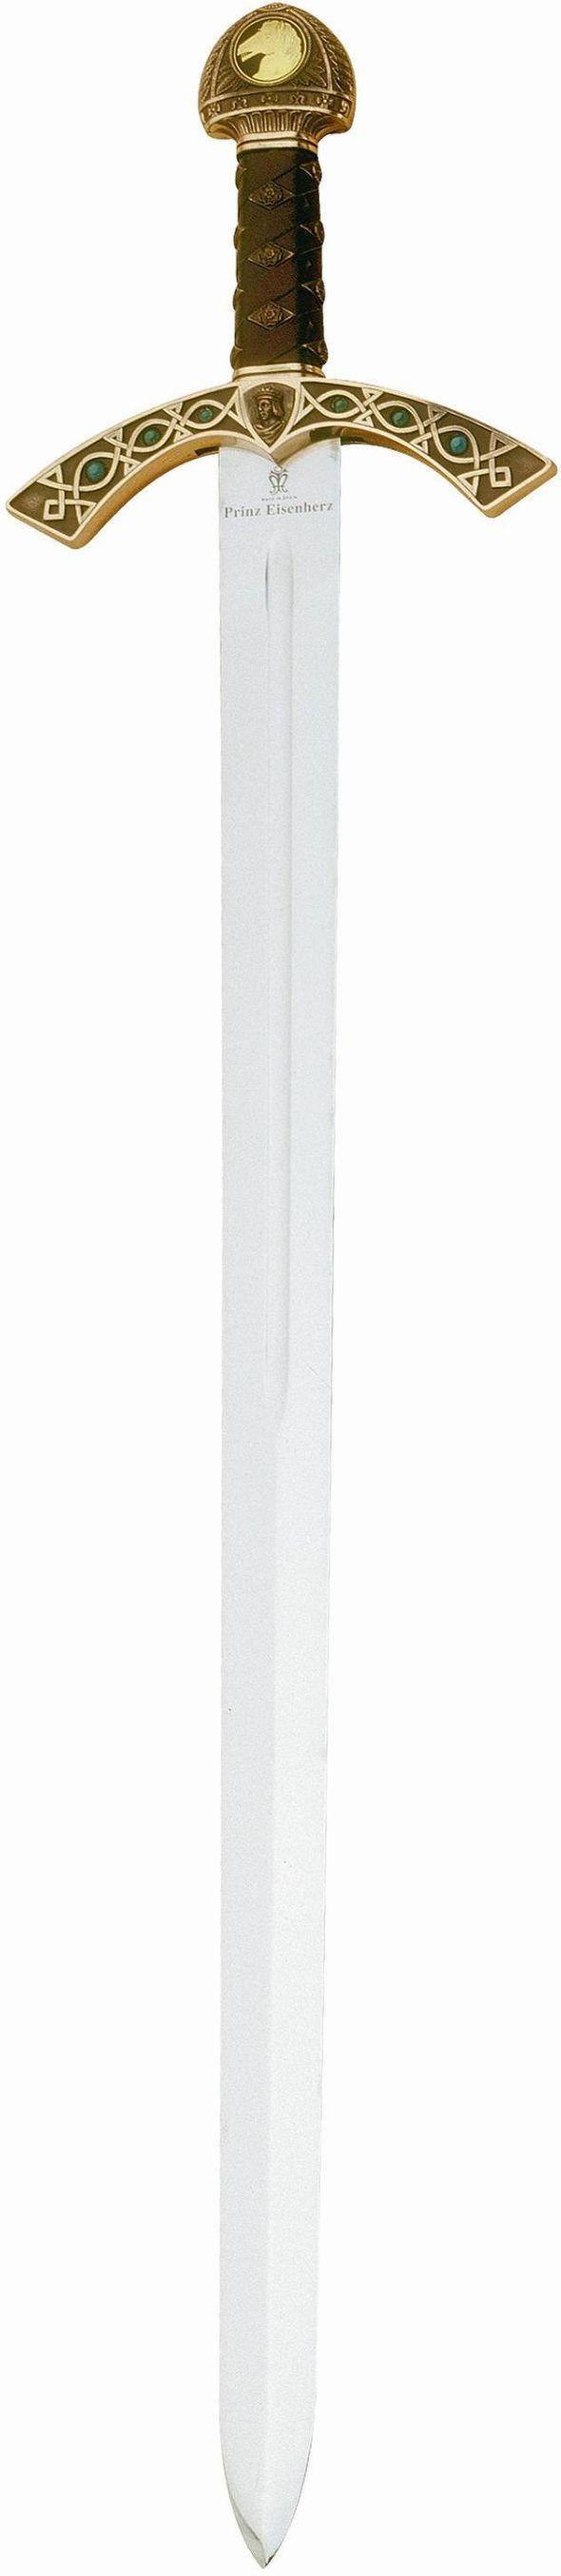 # 580 Prince Valiant Sword by Marto of Toledo Spain